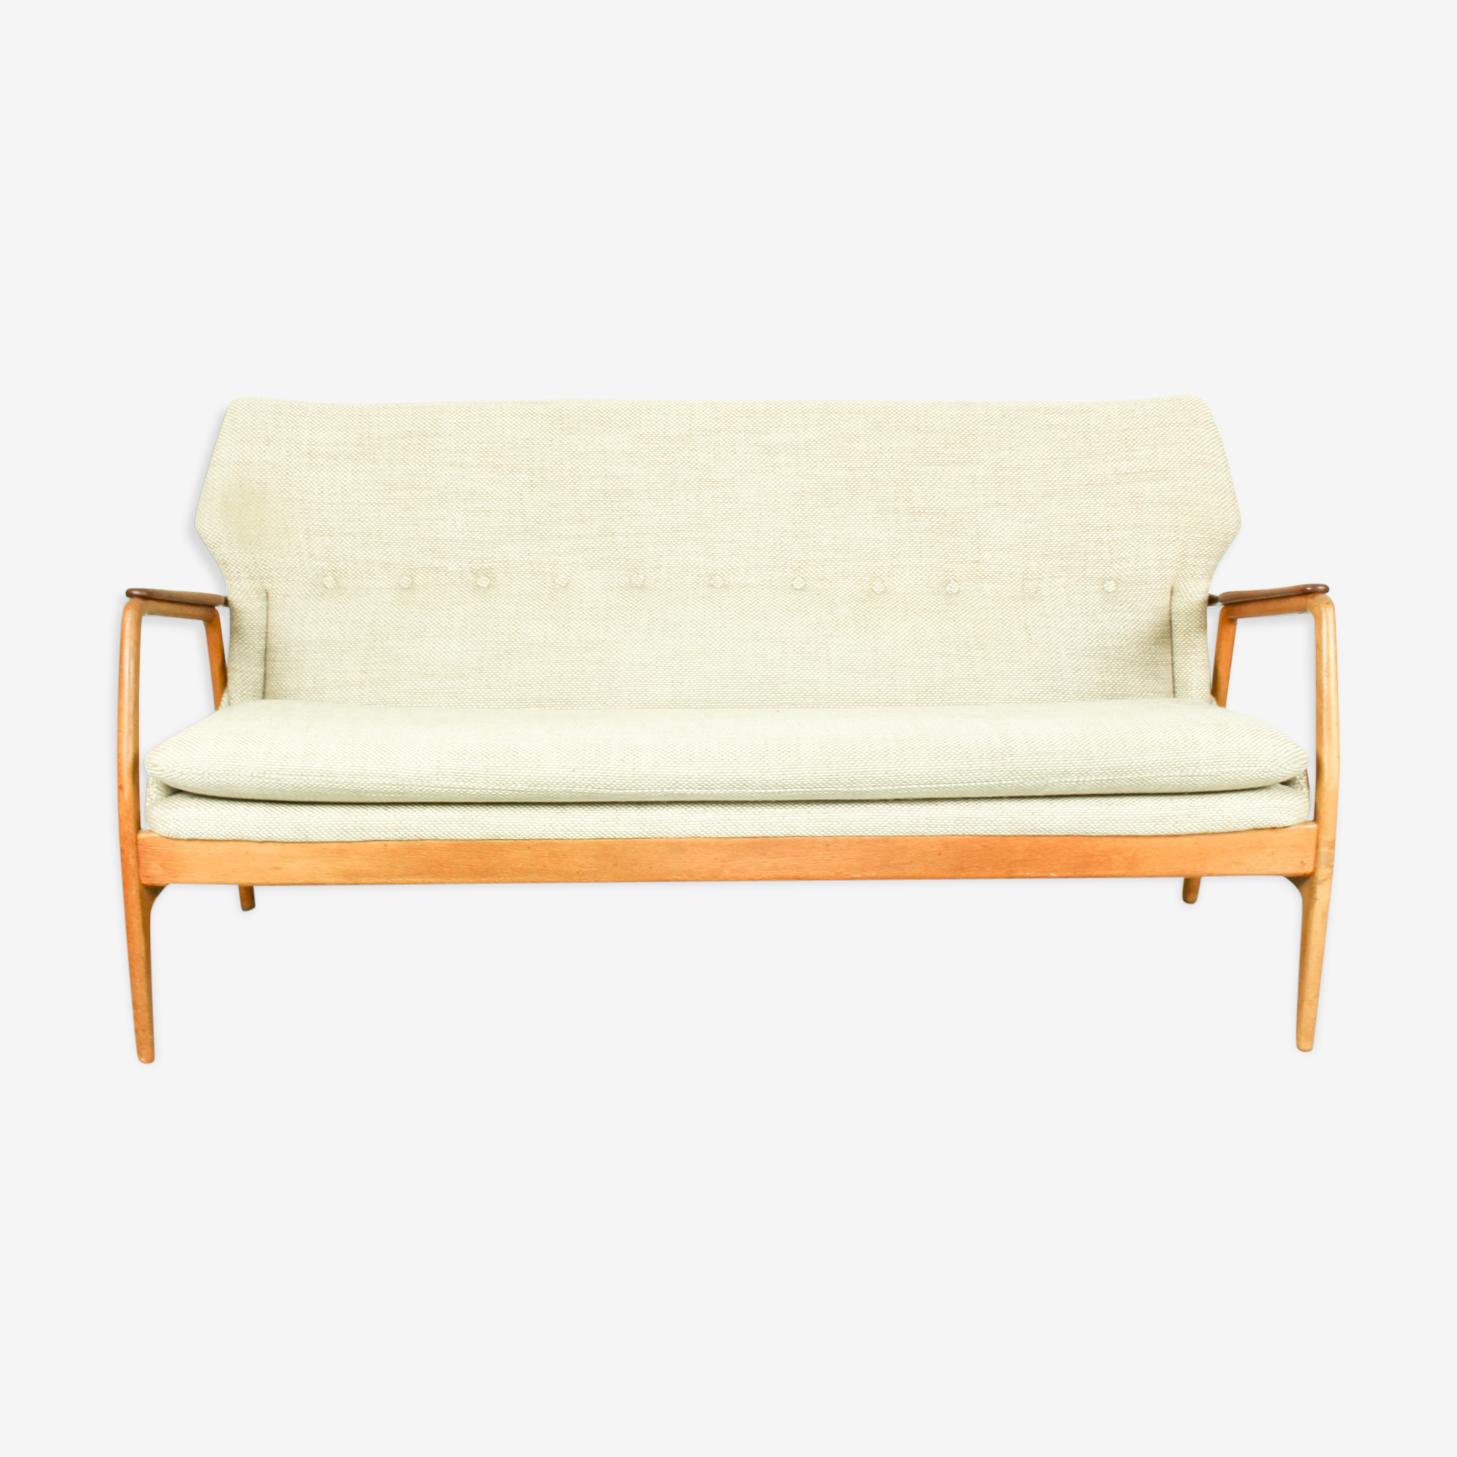 Canapé par Aksel Bender Madsen pour Bovenkamp, 1950